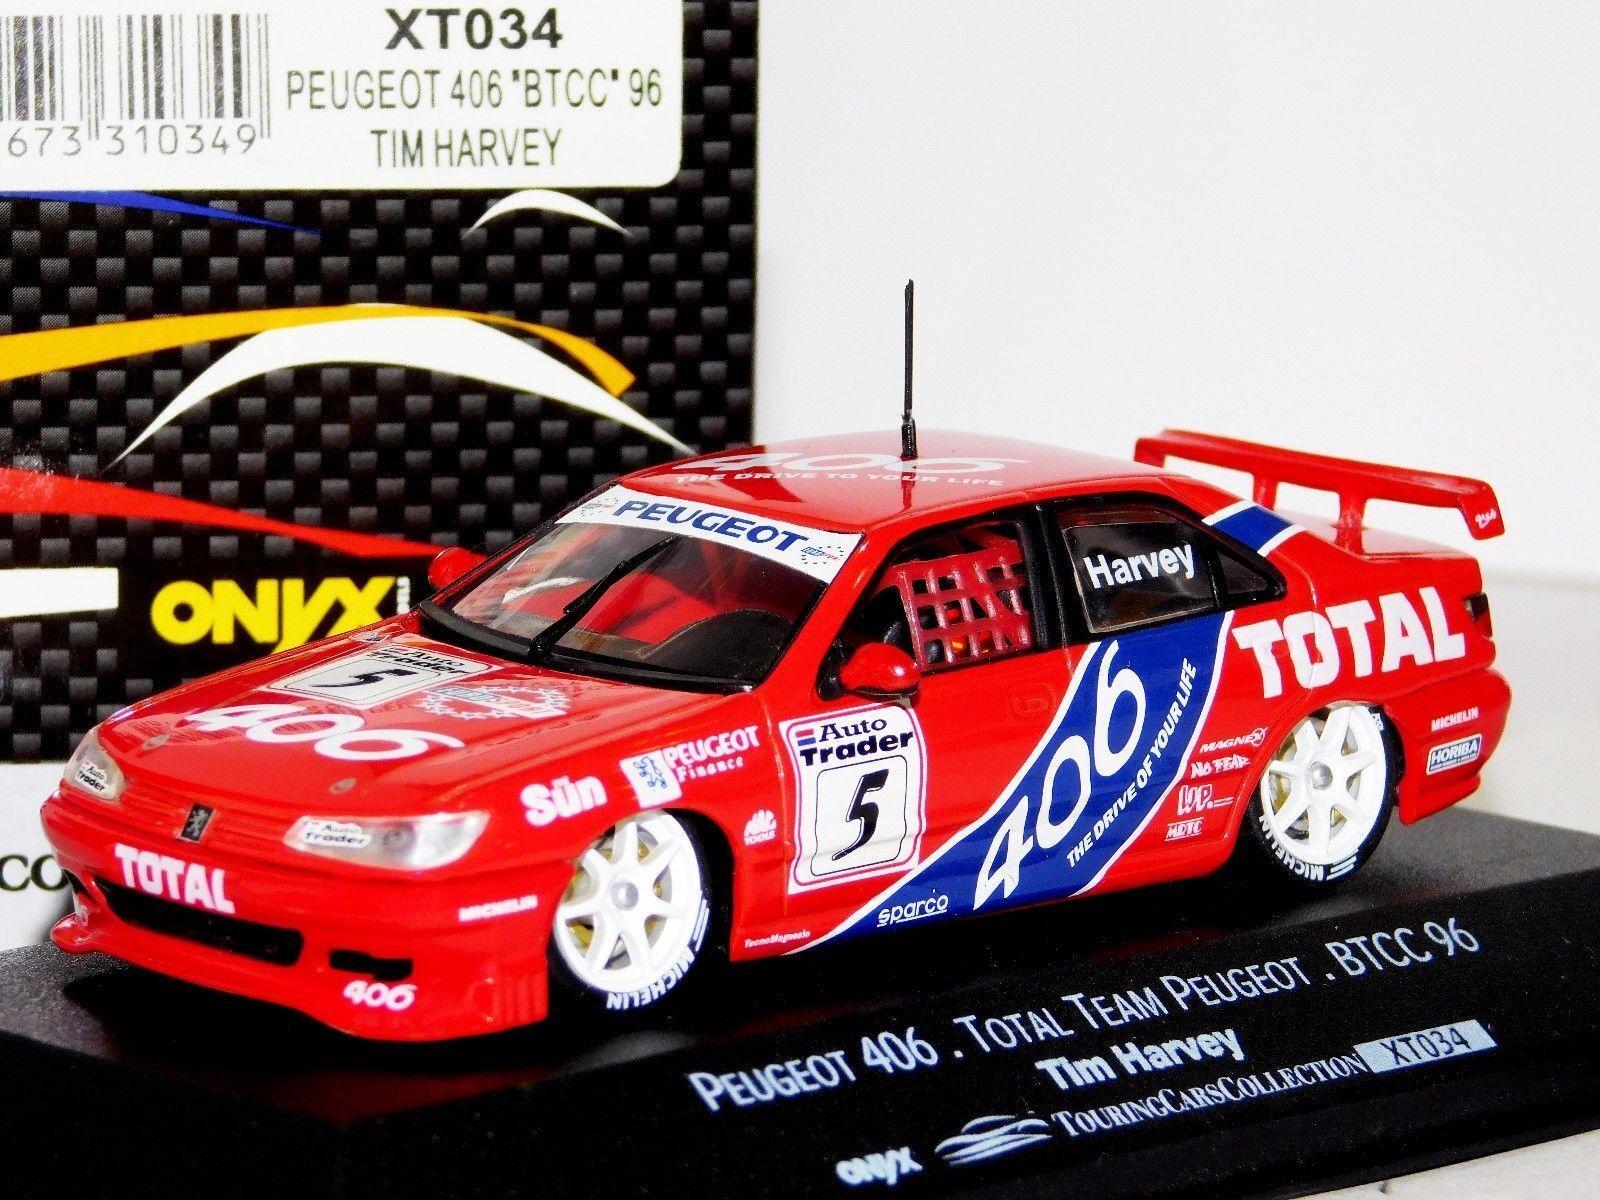 1//10 Touring Car Sticker Set BTCC Honda 1998-Team Xray VBR PR RACING Schumacher